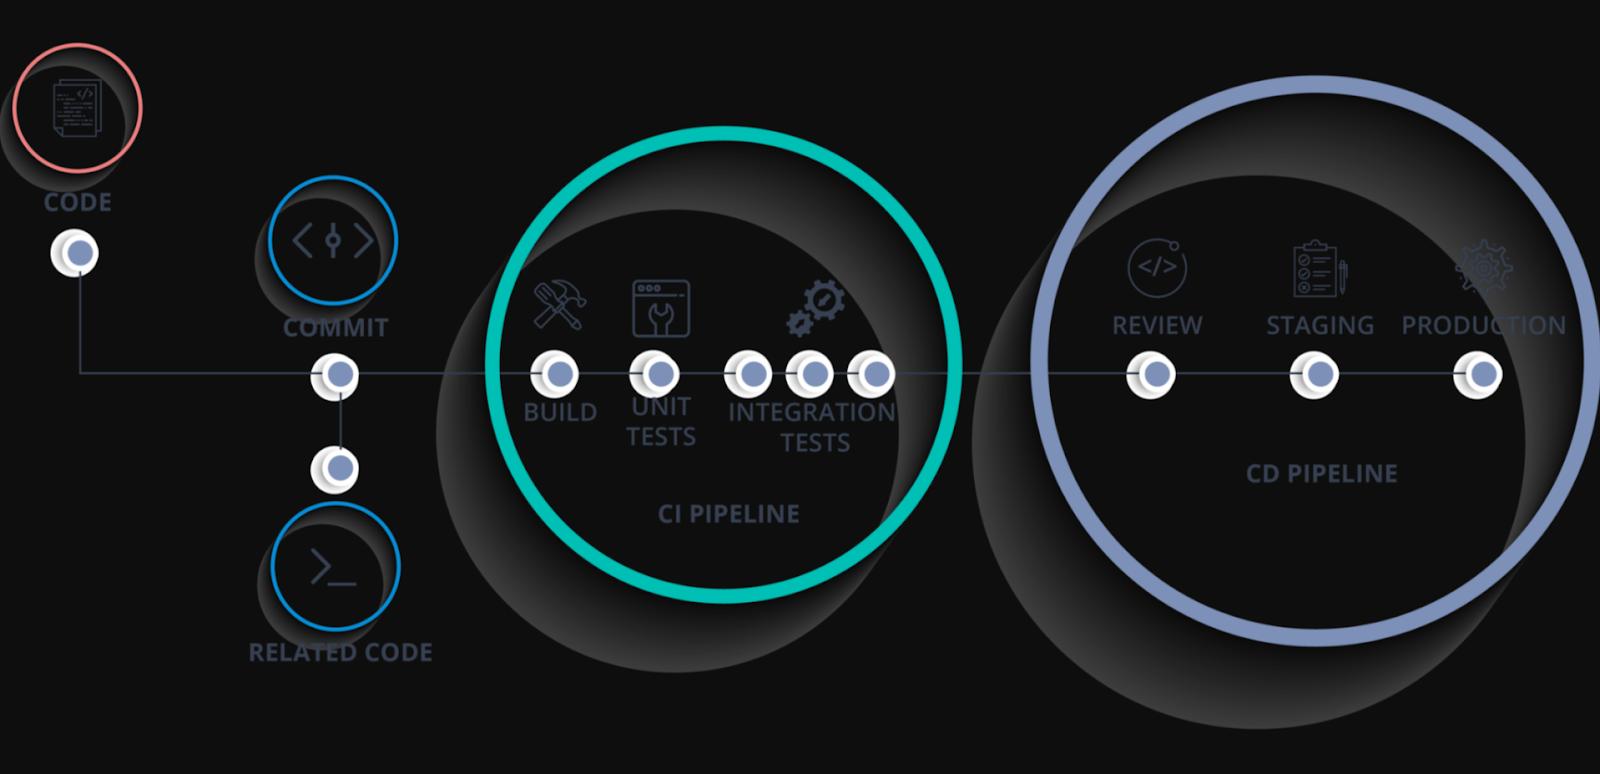 CICD pipeline